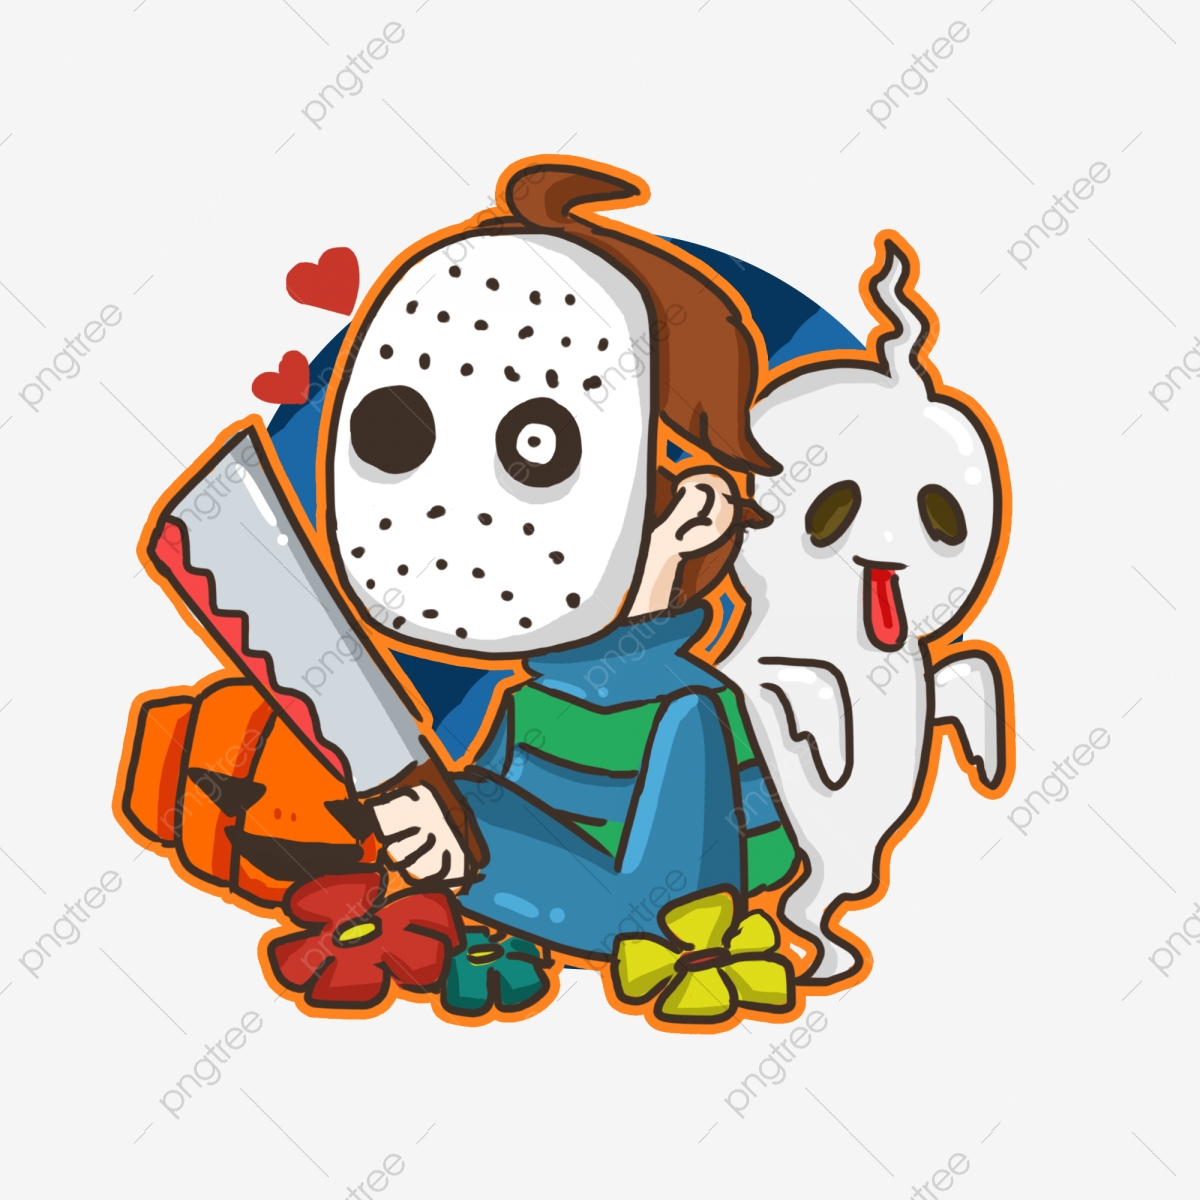 Kartun Lucu Pembunuh Halloween Penanda Doodle Unsur